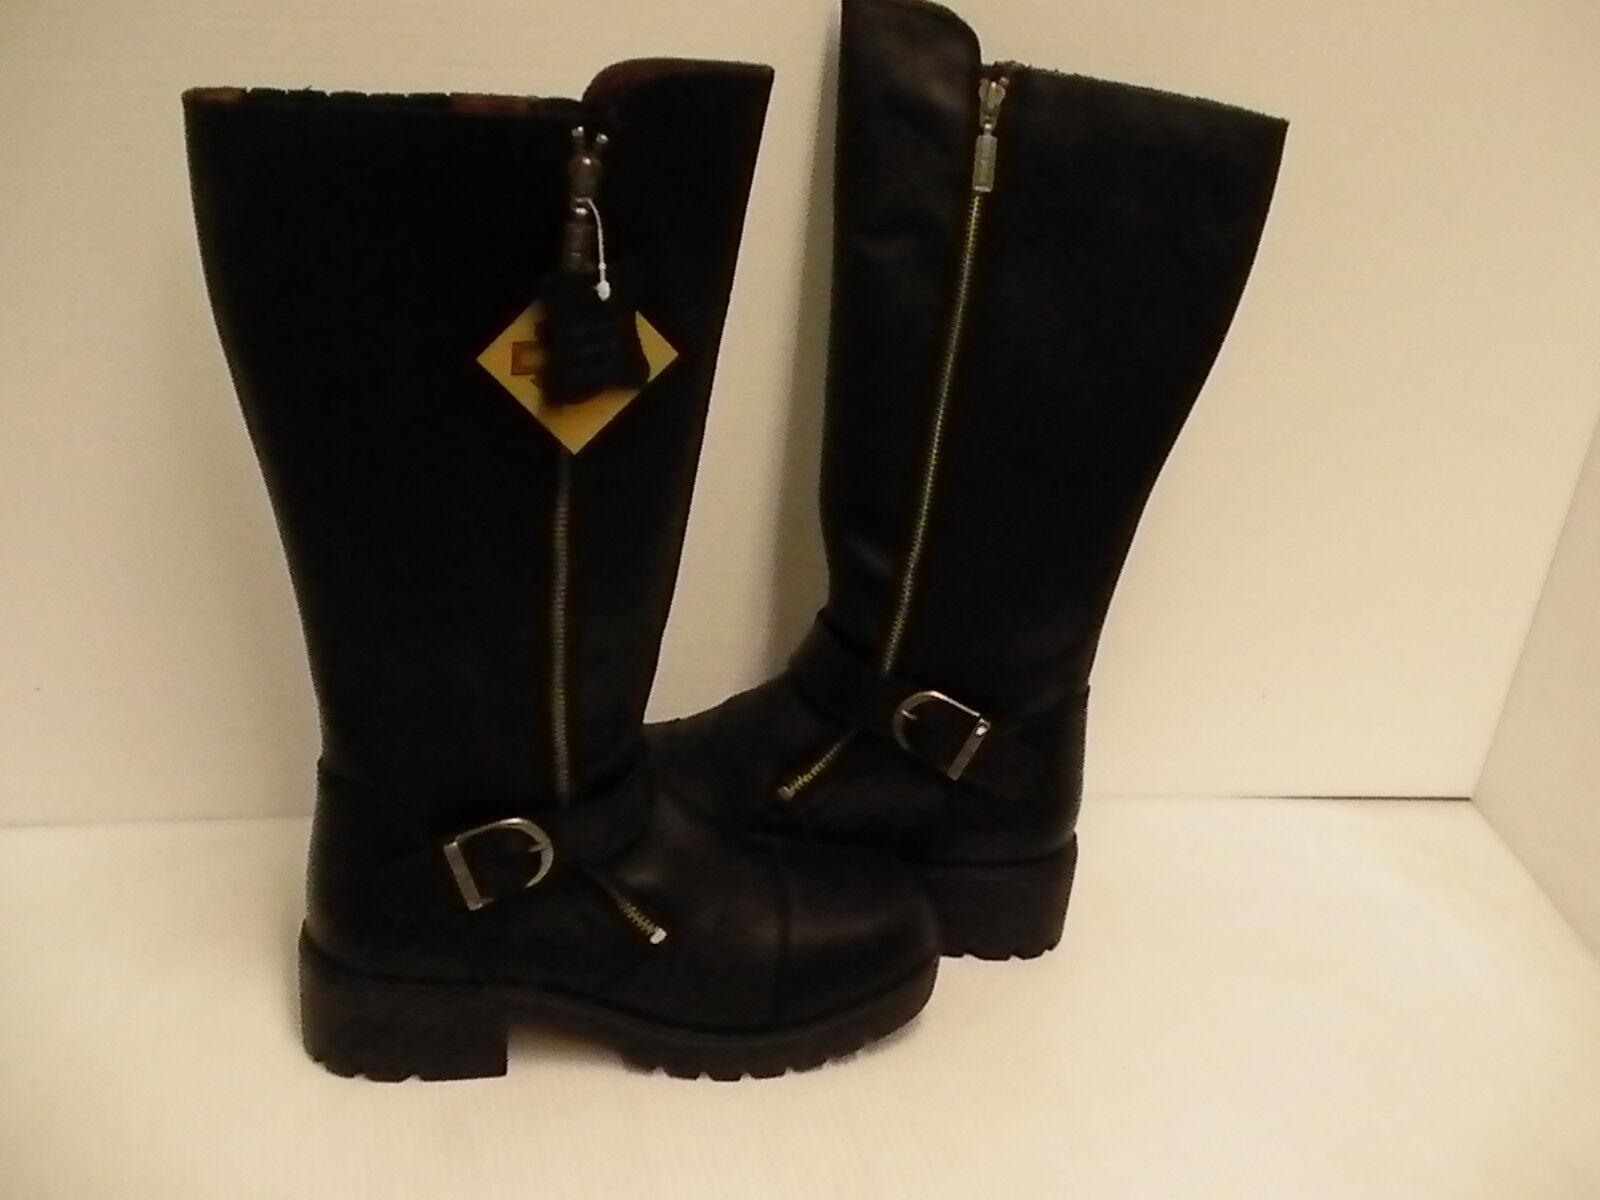 Women's harley davidson boots size 9.5 west end zipper knee black 82015 new